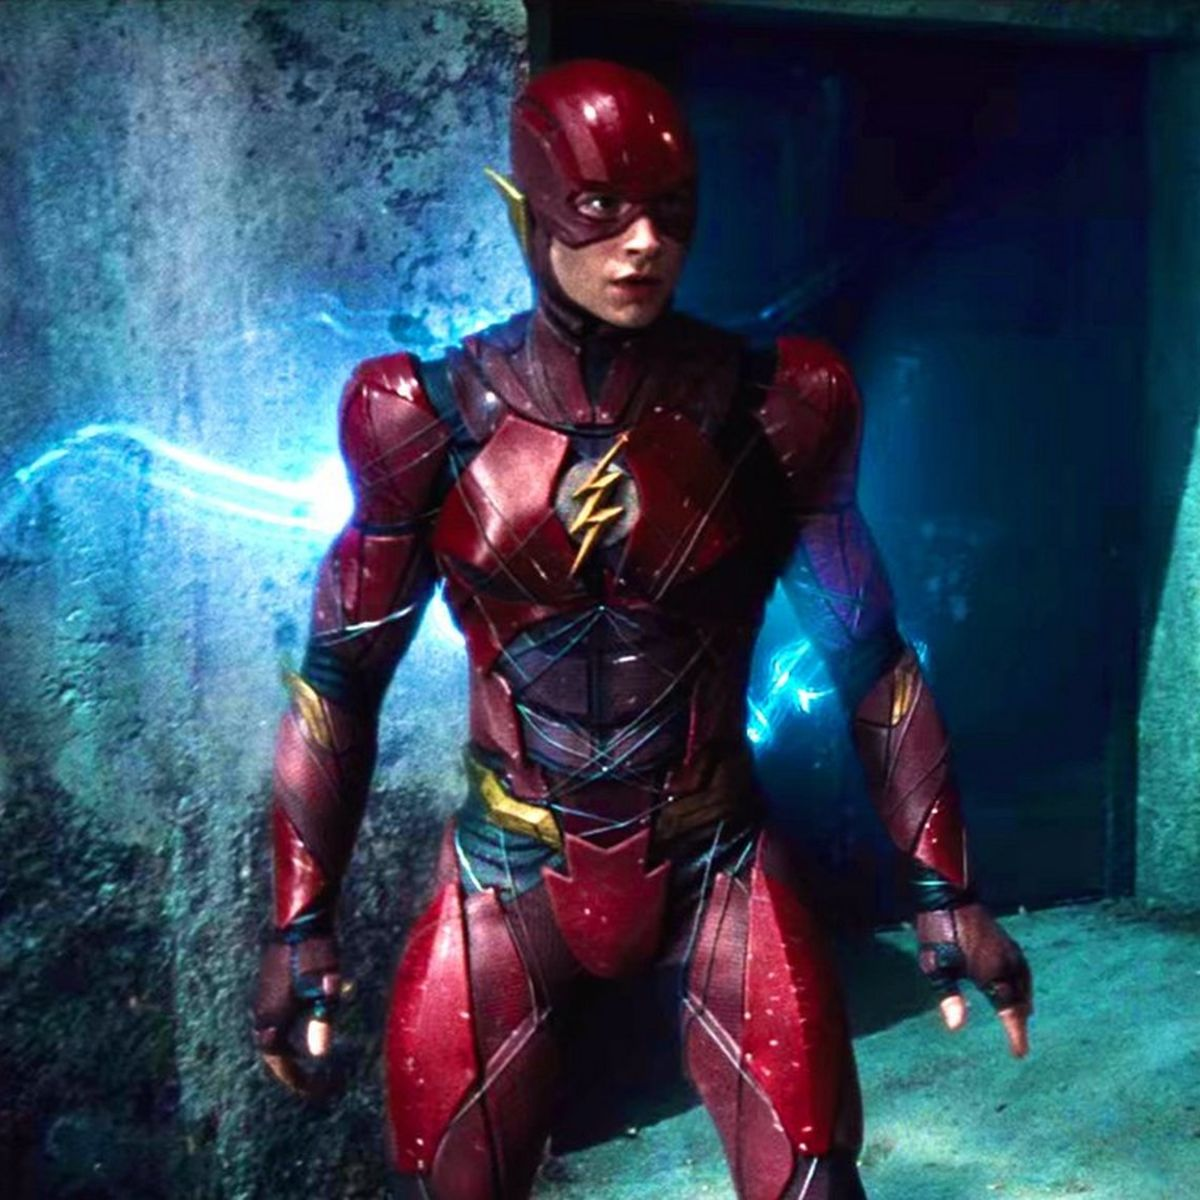 The-Flash-Ezra-Miller